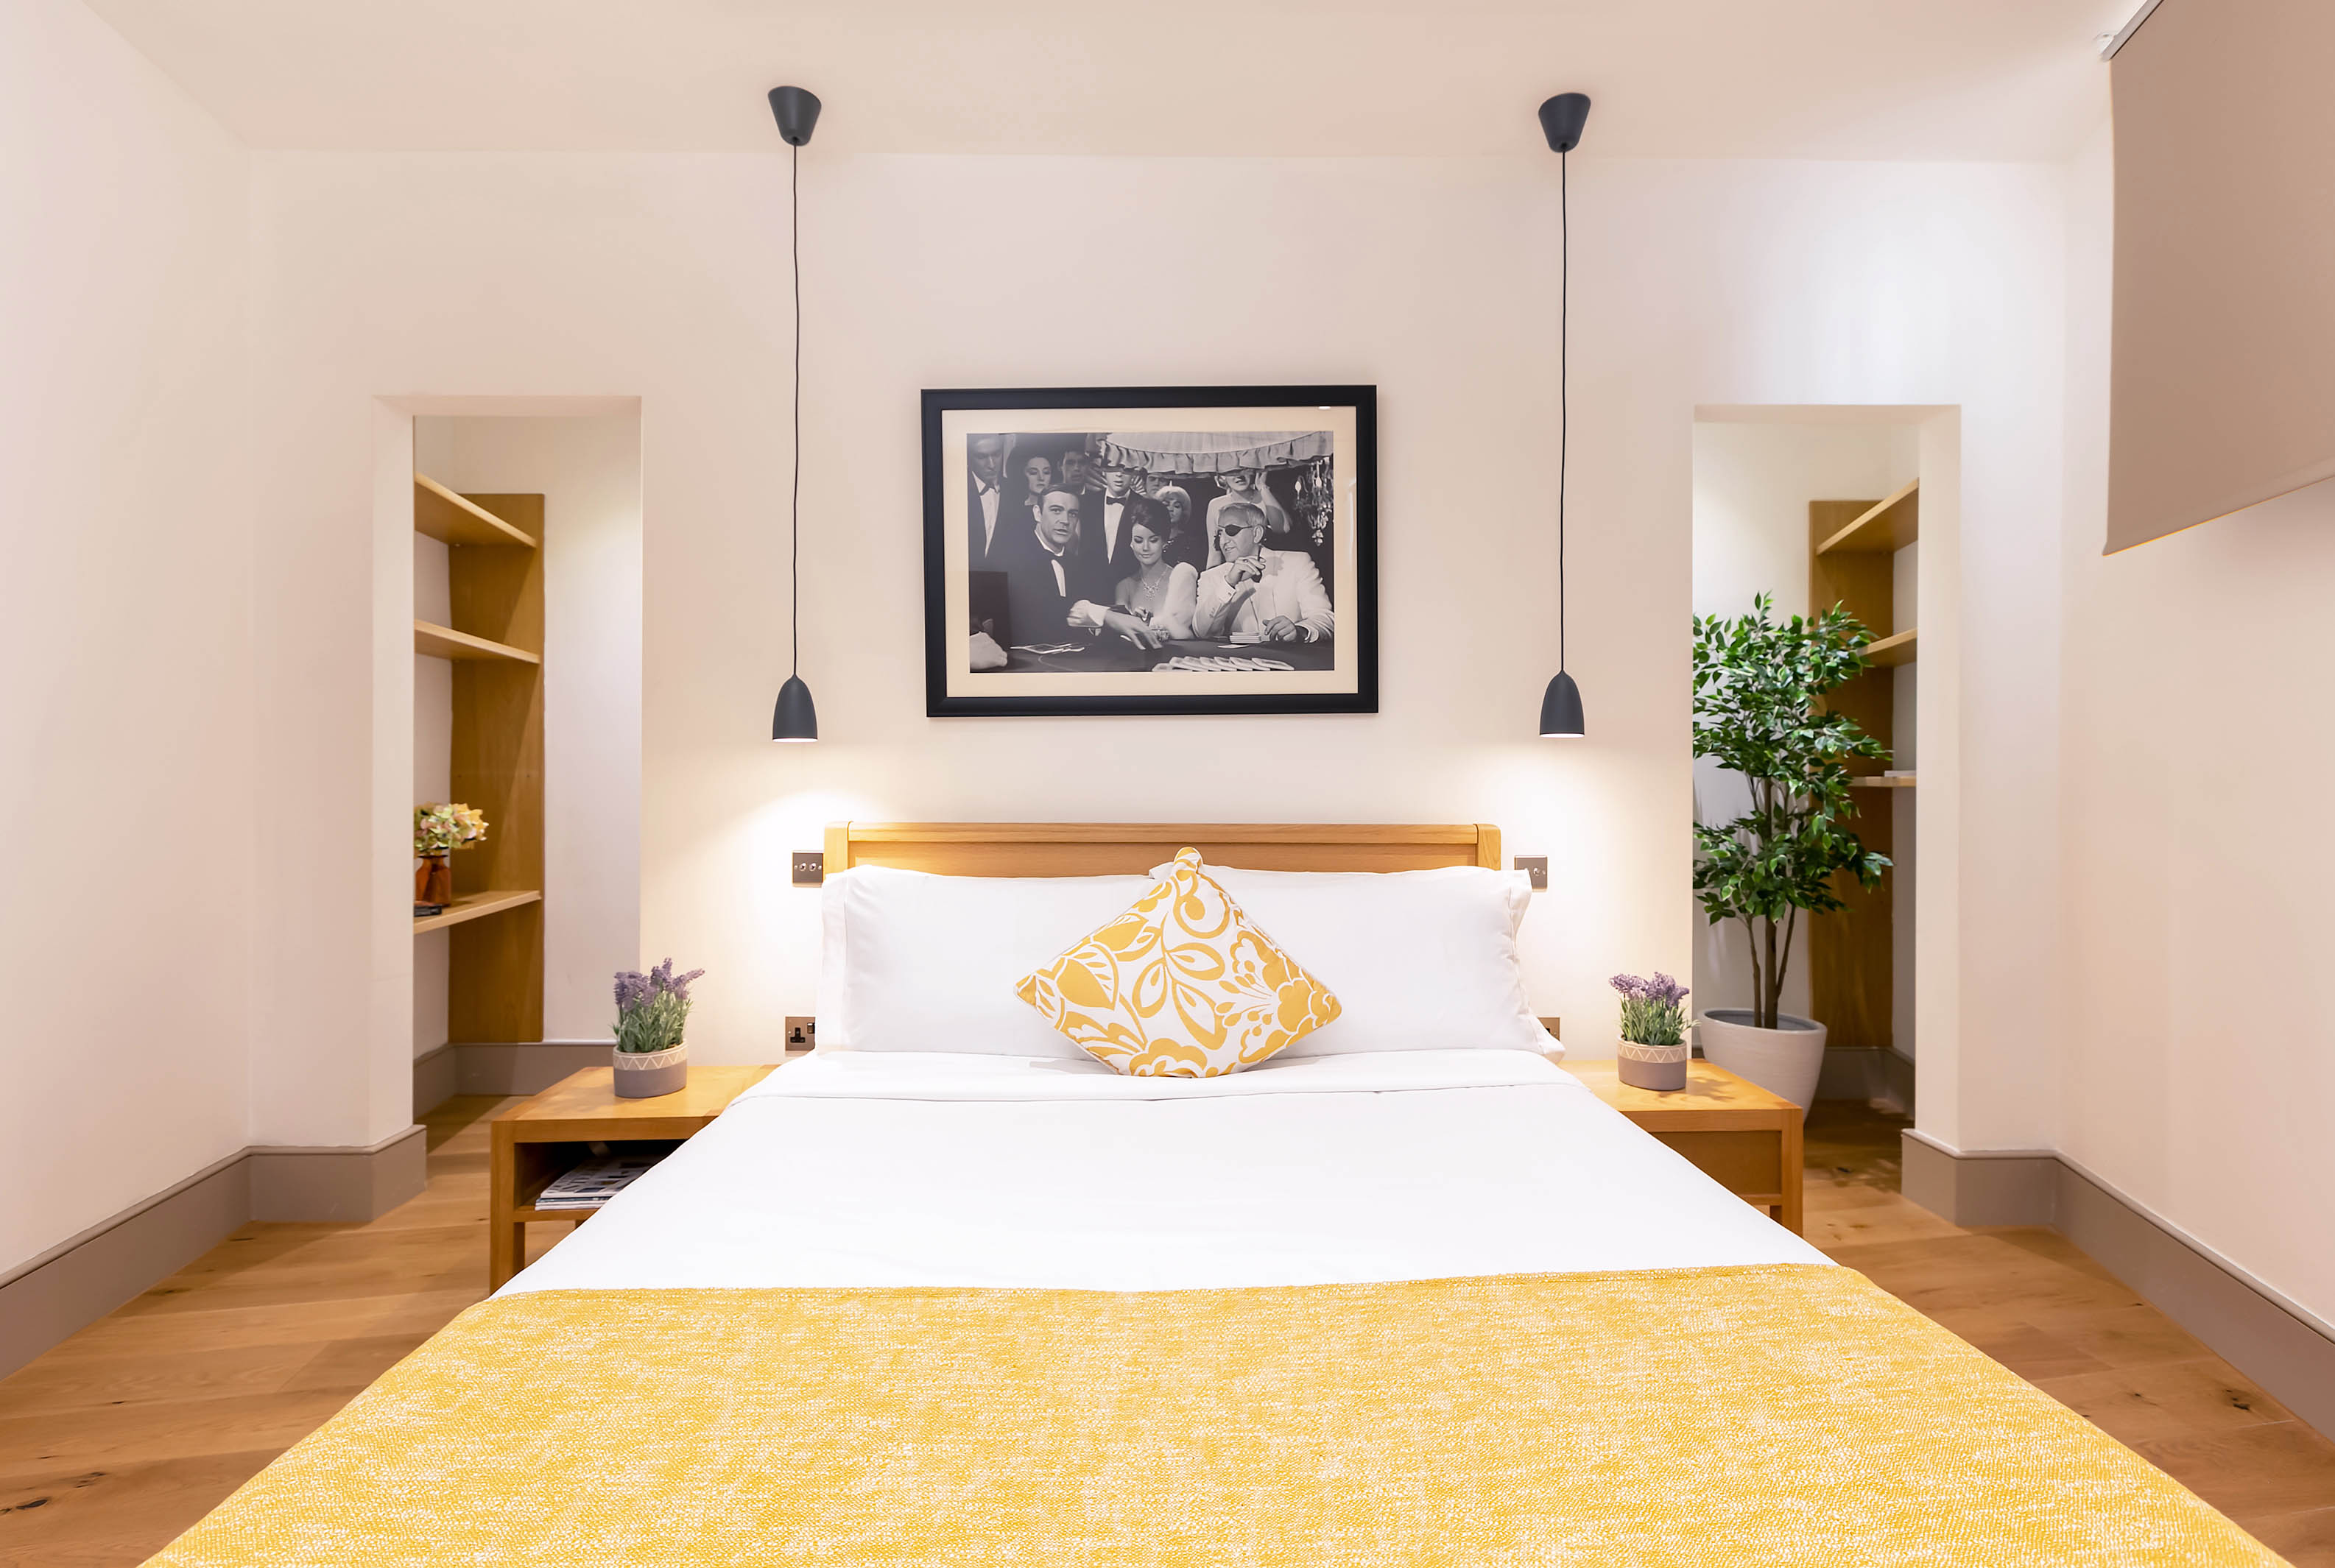 Lovelydays luxury service apartment rental - London - Fitzrovia - Wells Mews B - Lovelysuite - 2 bedrooms - 2 bathrooms - Double bed - dbcf032c673b - Lovelydays